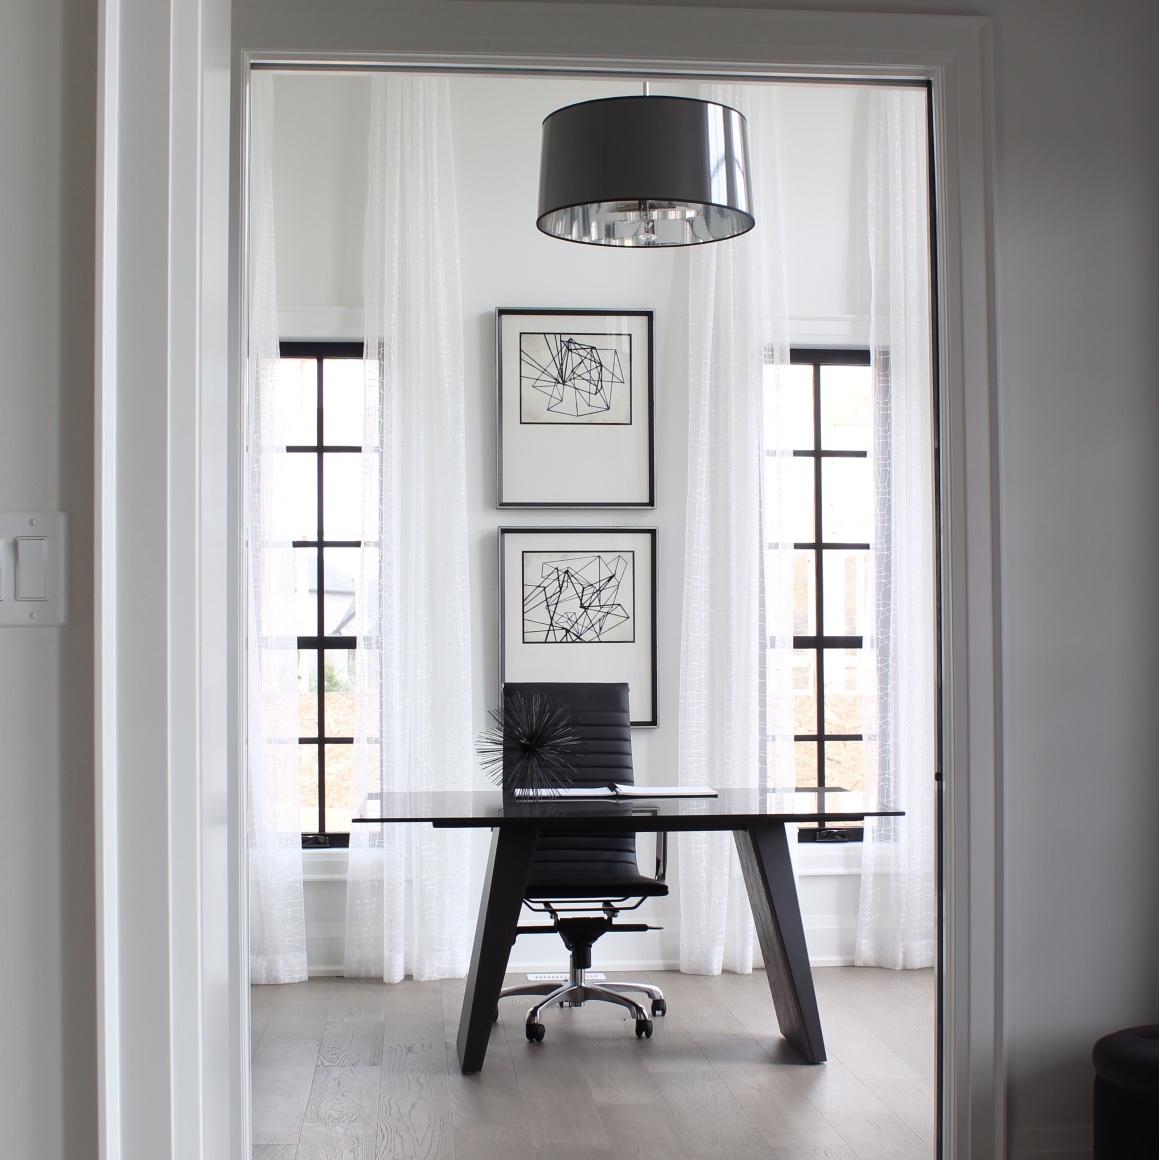 Striking Black and White Interior Design